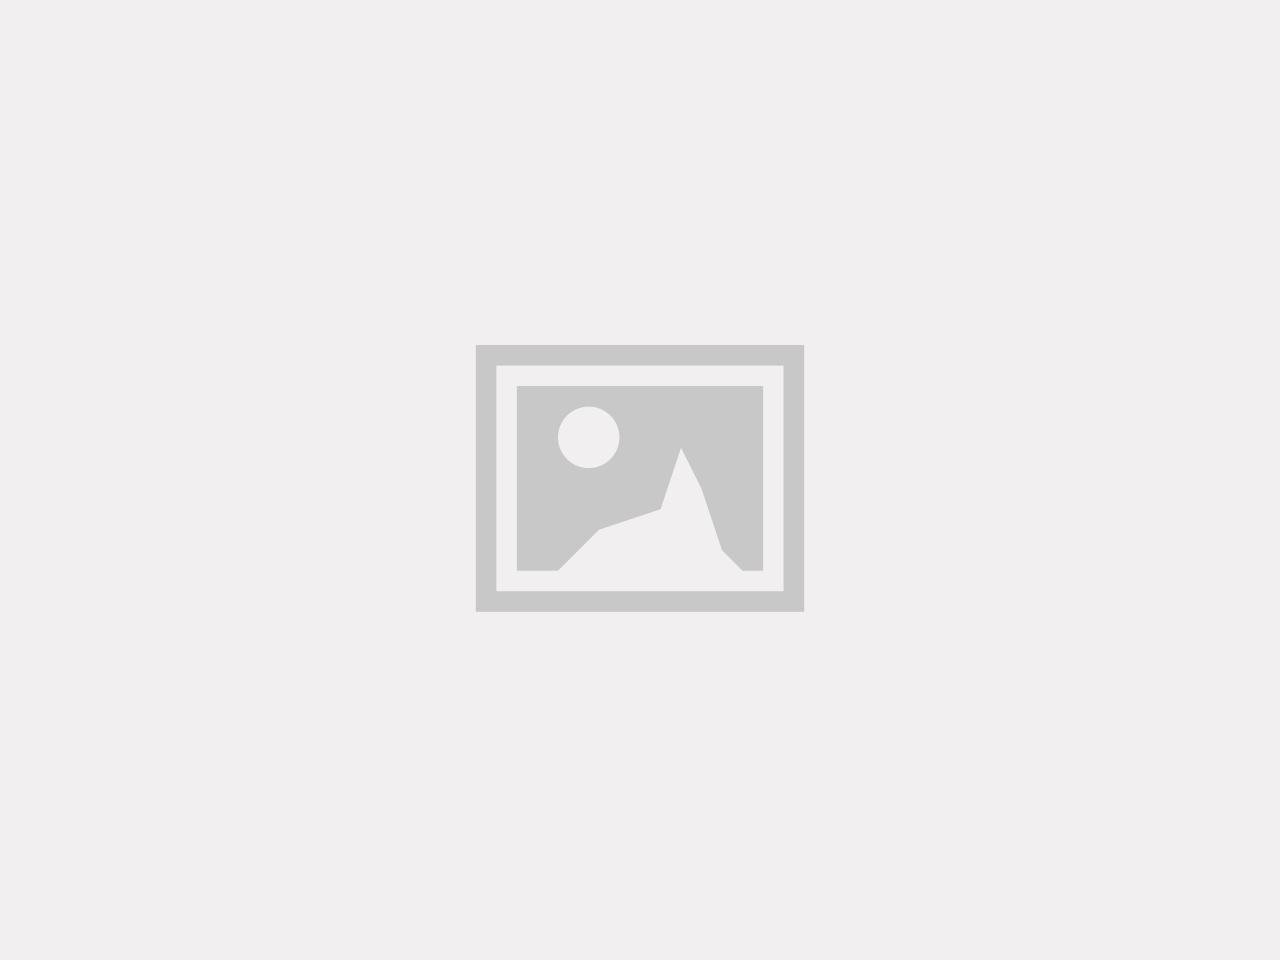 P30 Lite New Edition (MAR-L21BX)